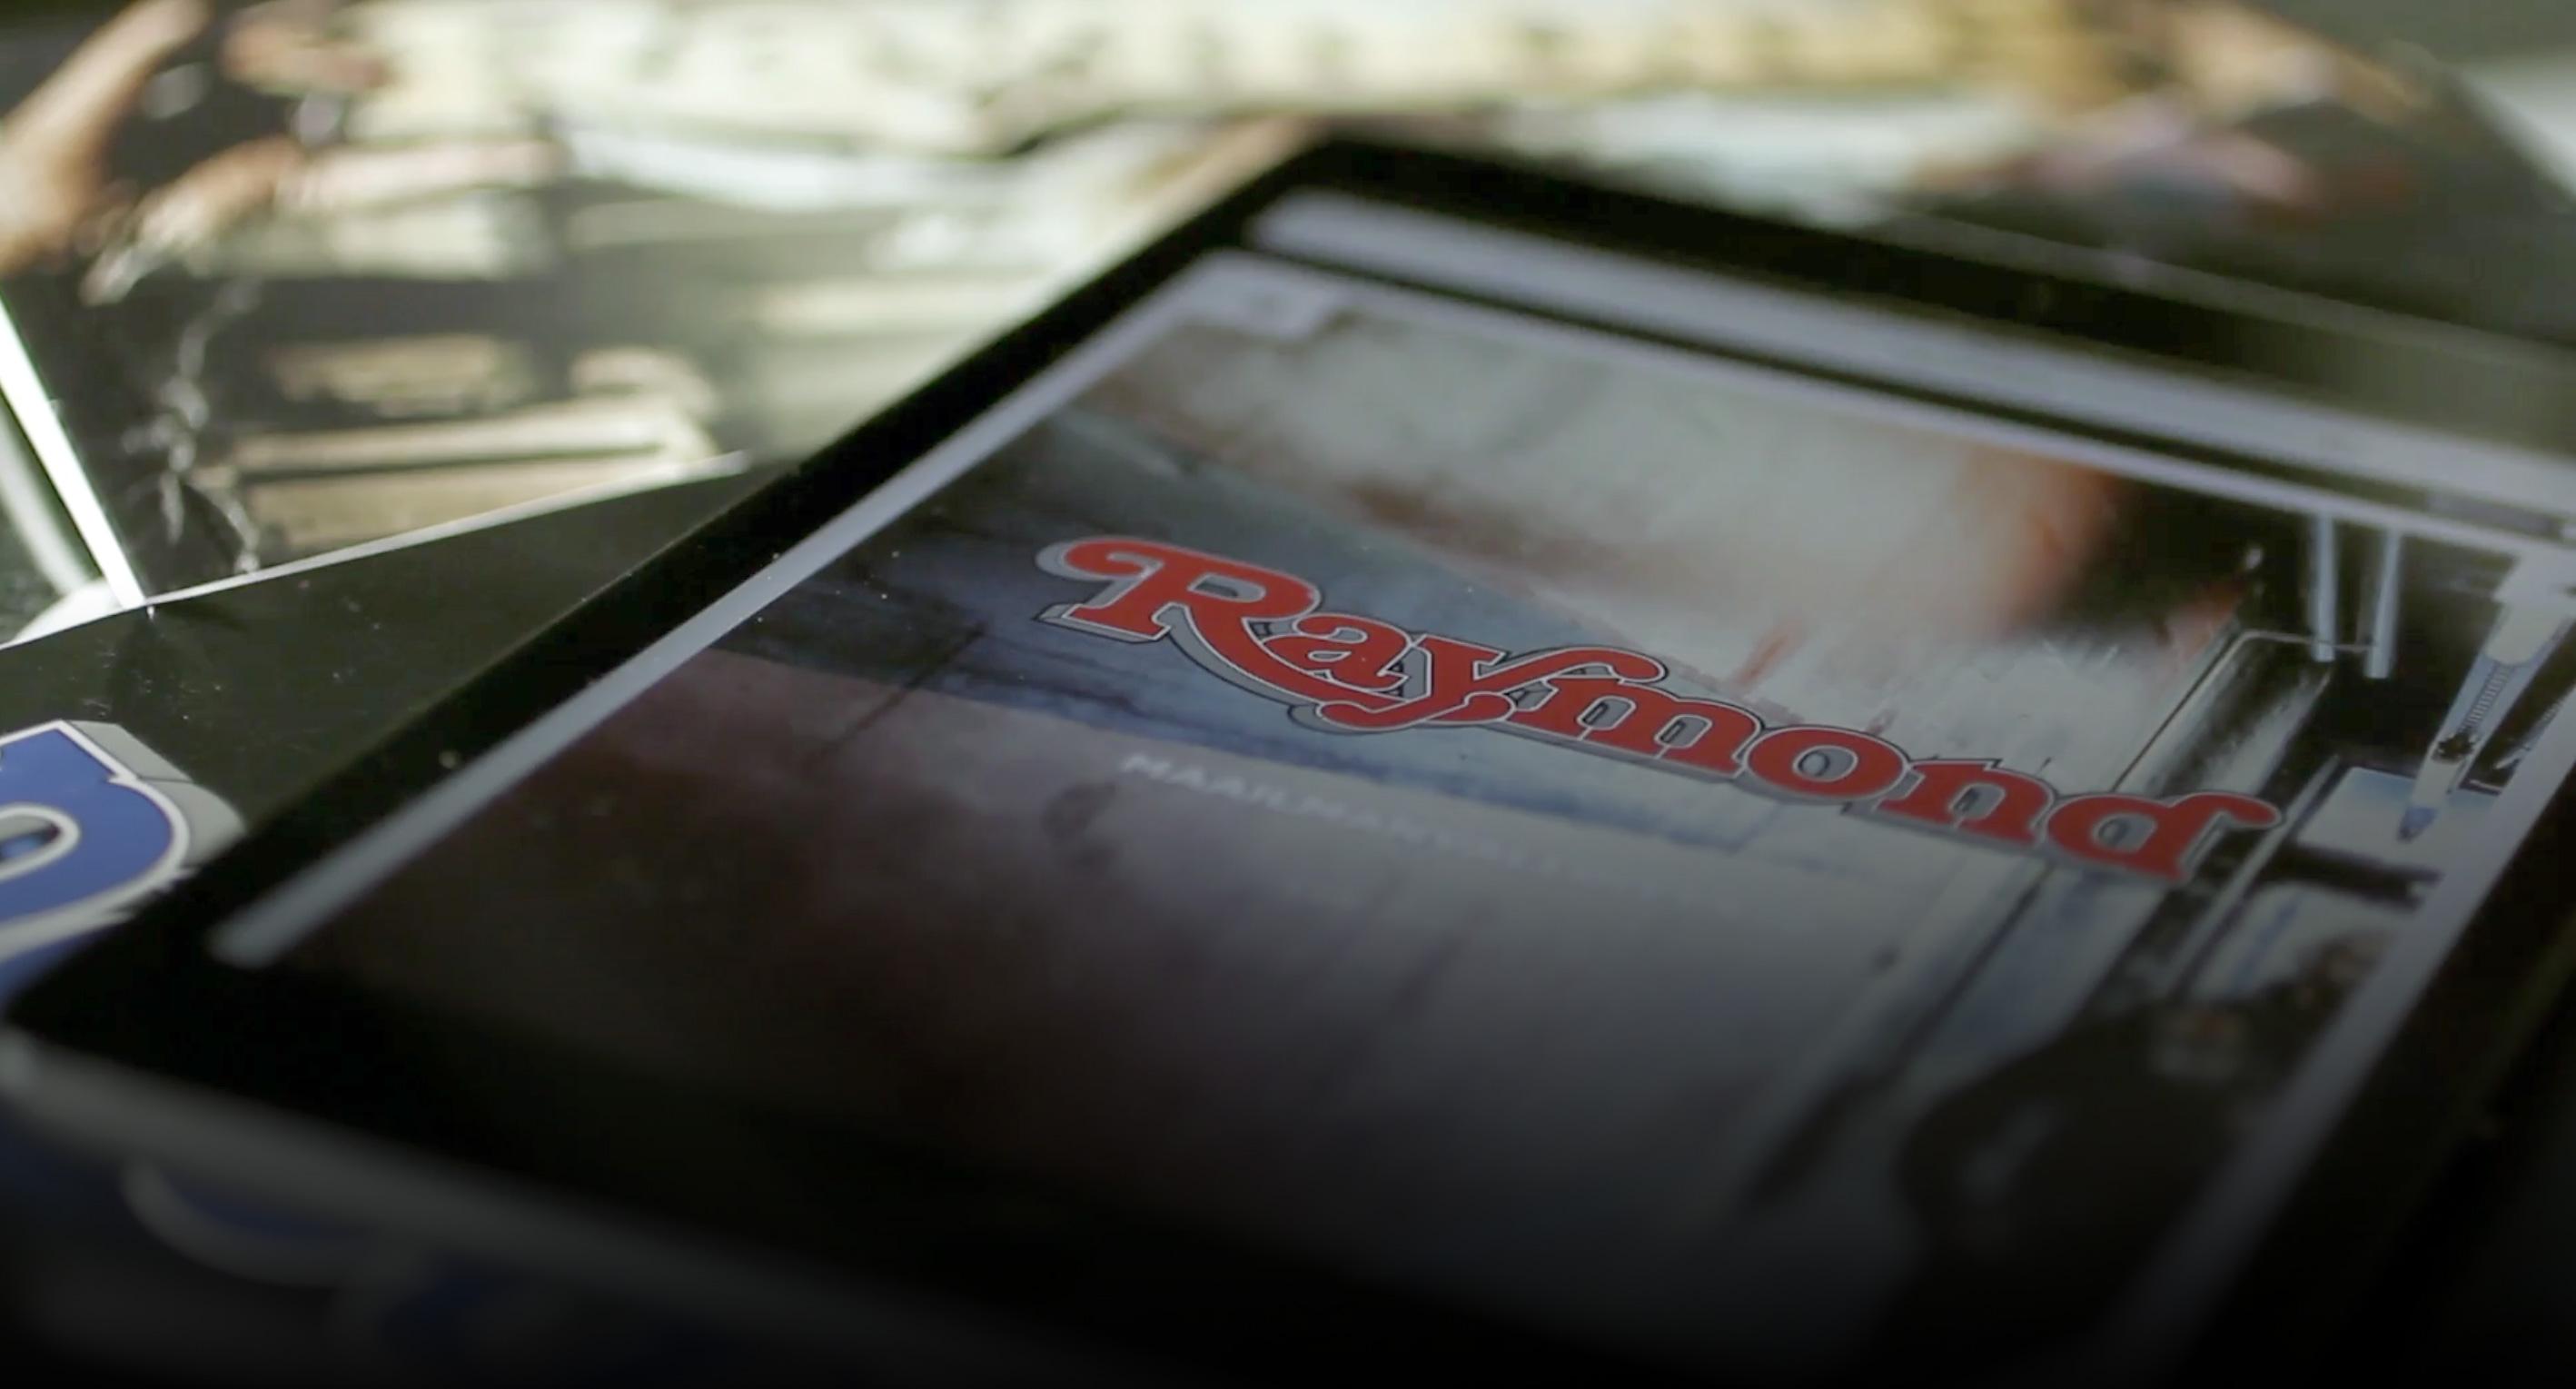 raymond.fi website